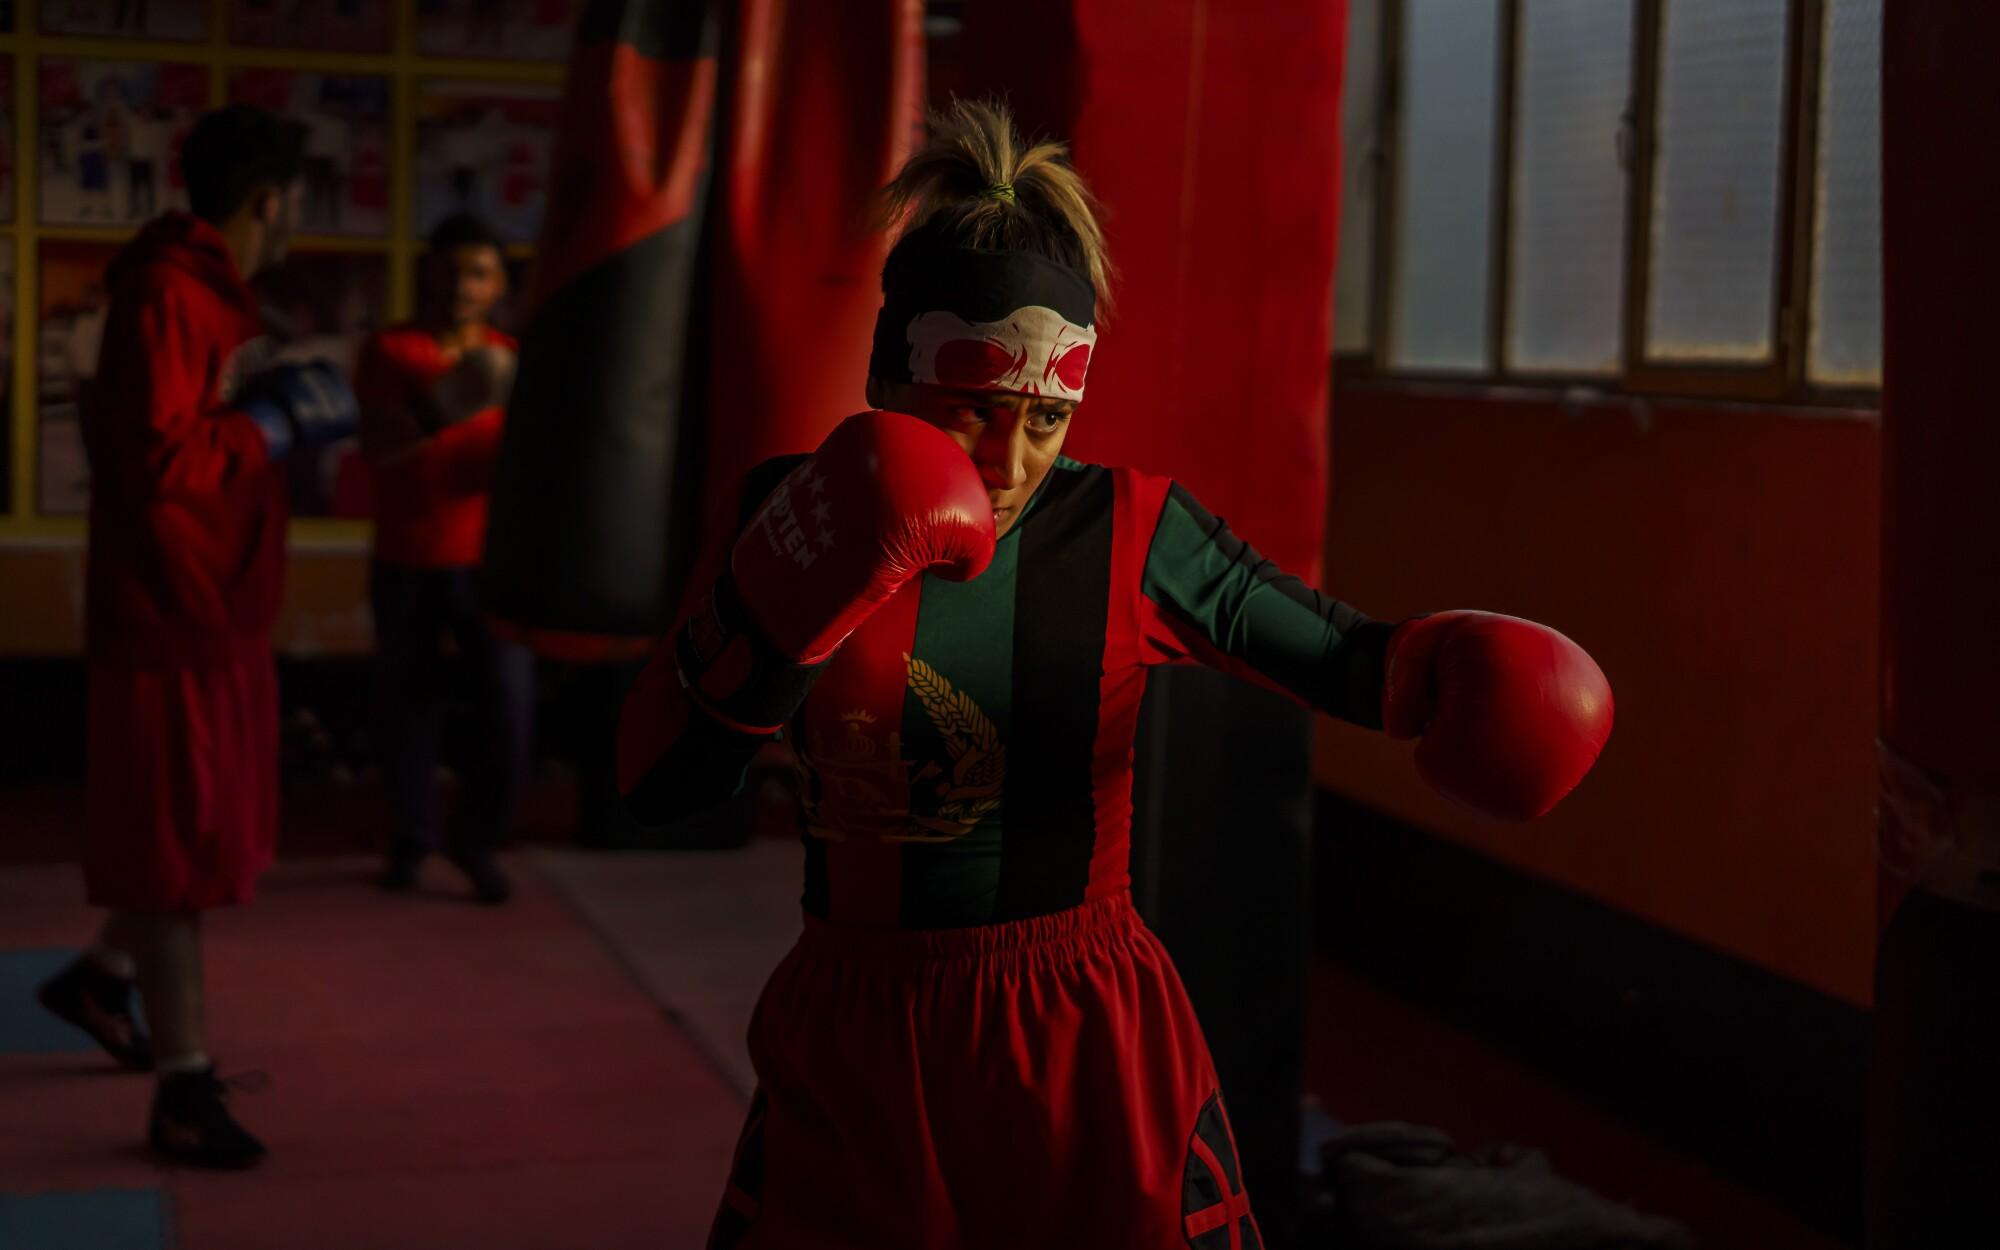 Khurshid Muhammadi, in boxing gloves, holds a fighting stance inside a Kabul gym.